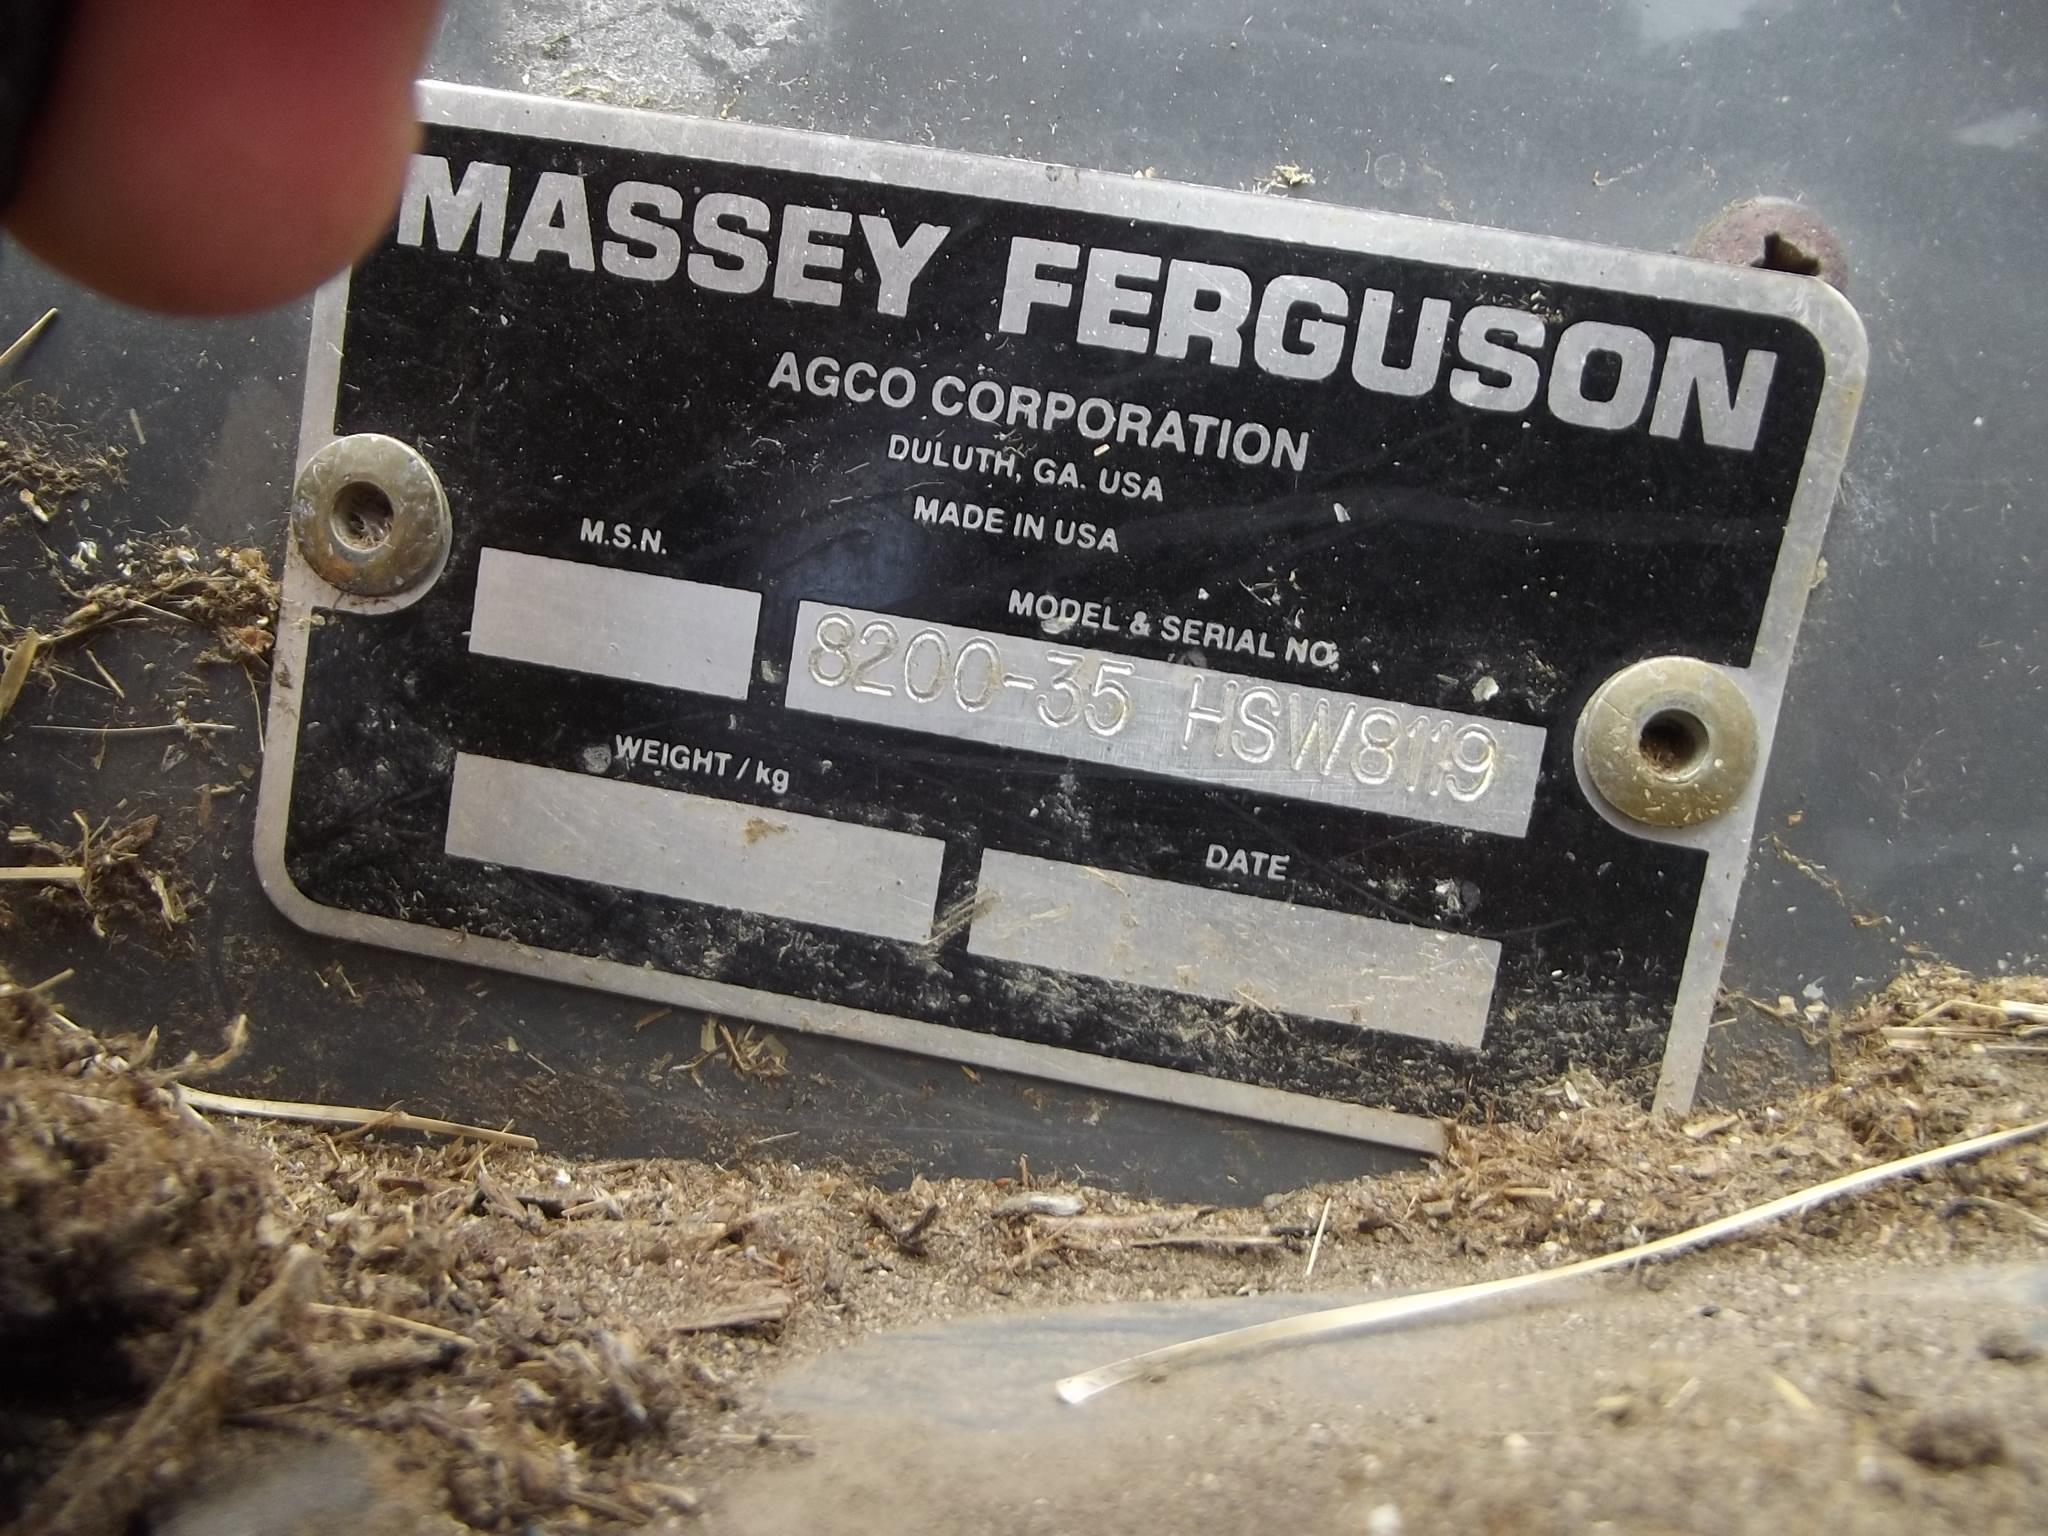 2007 Massey Ferguson 8200 Butler Machinery